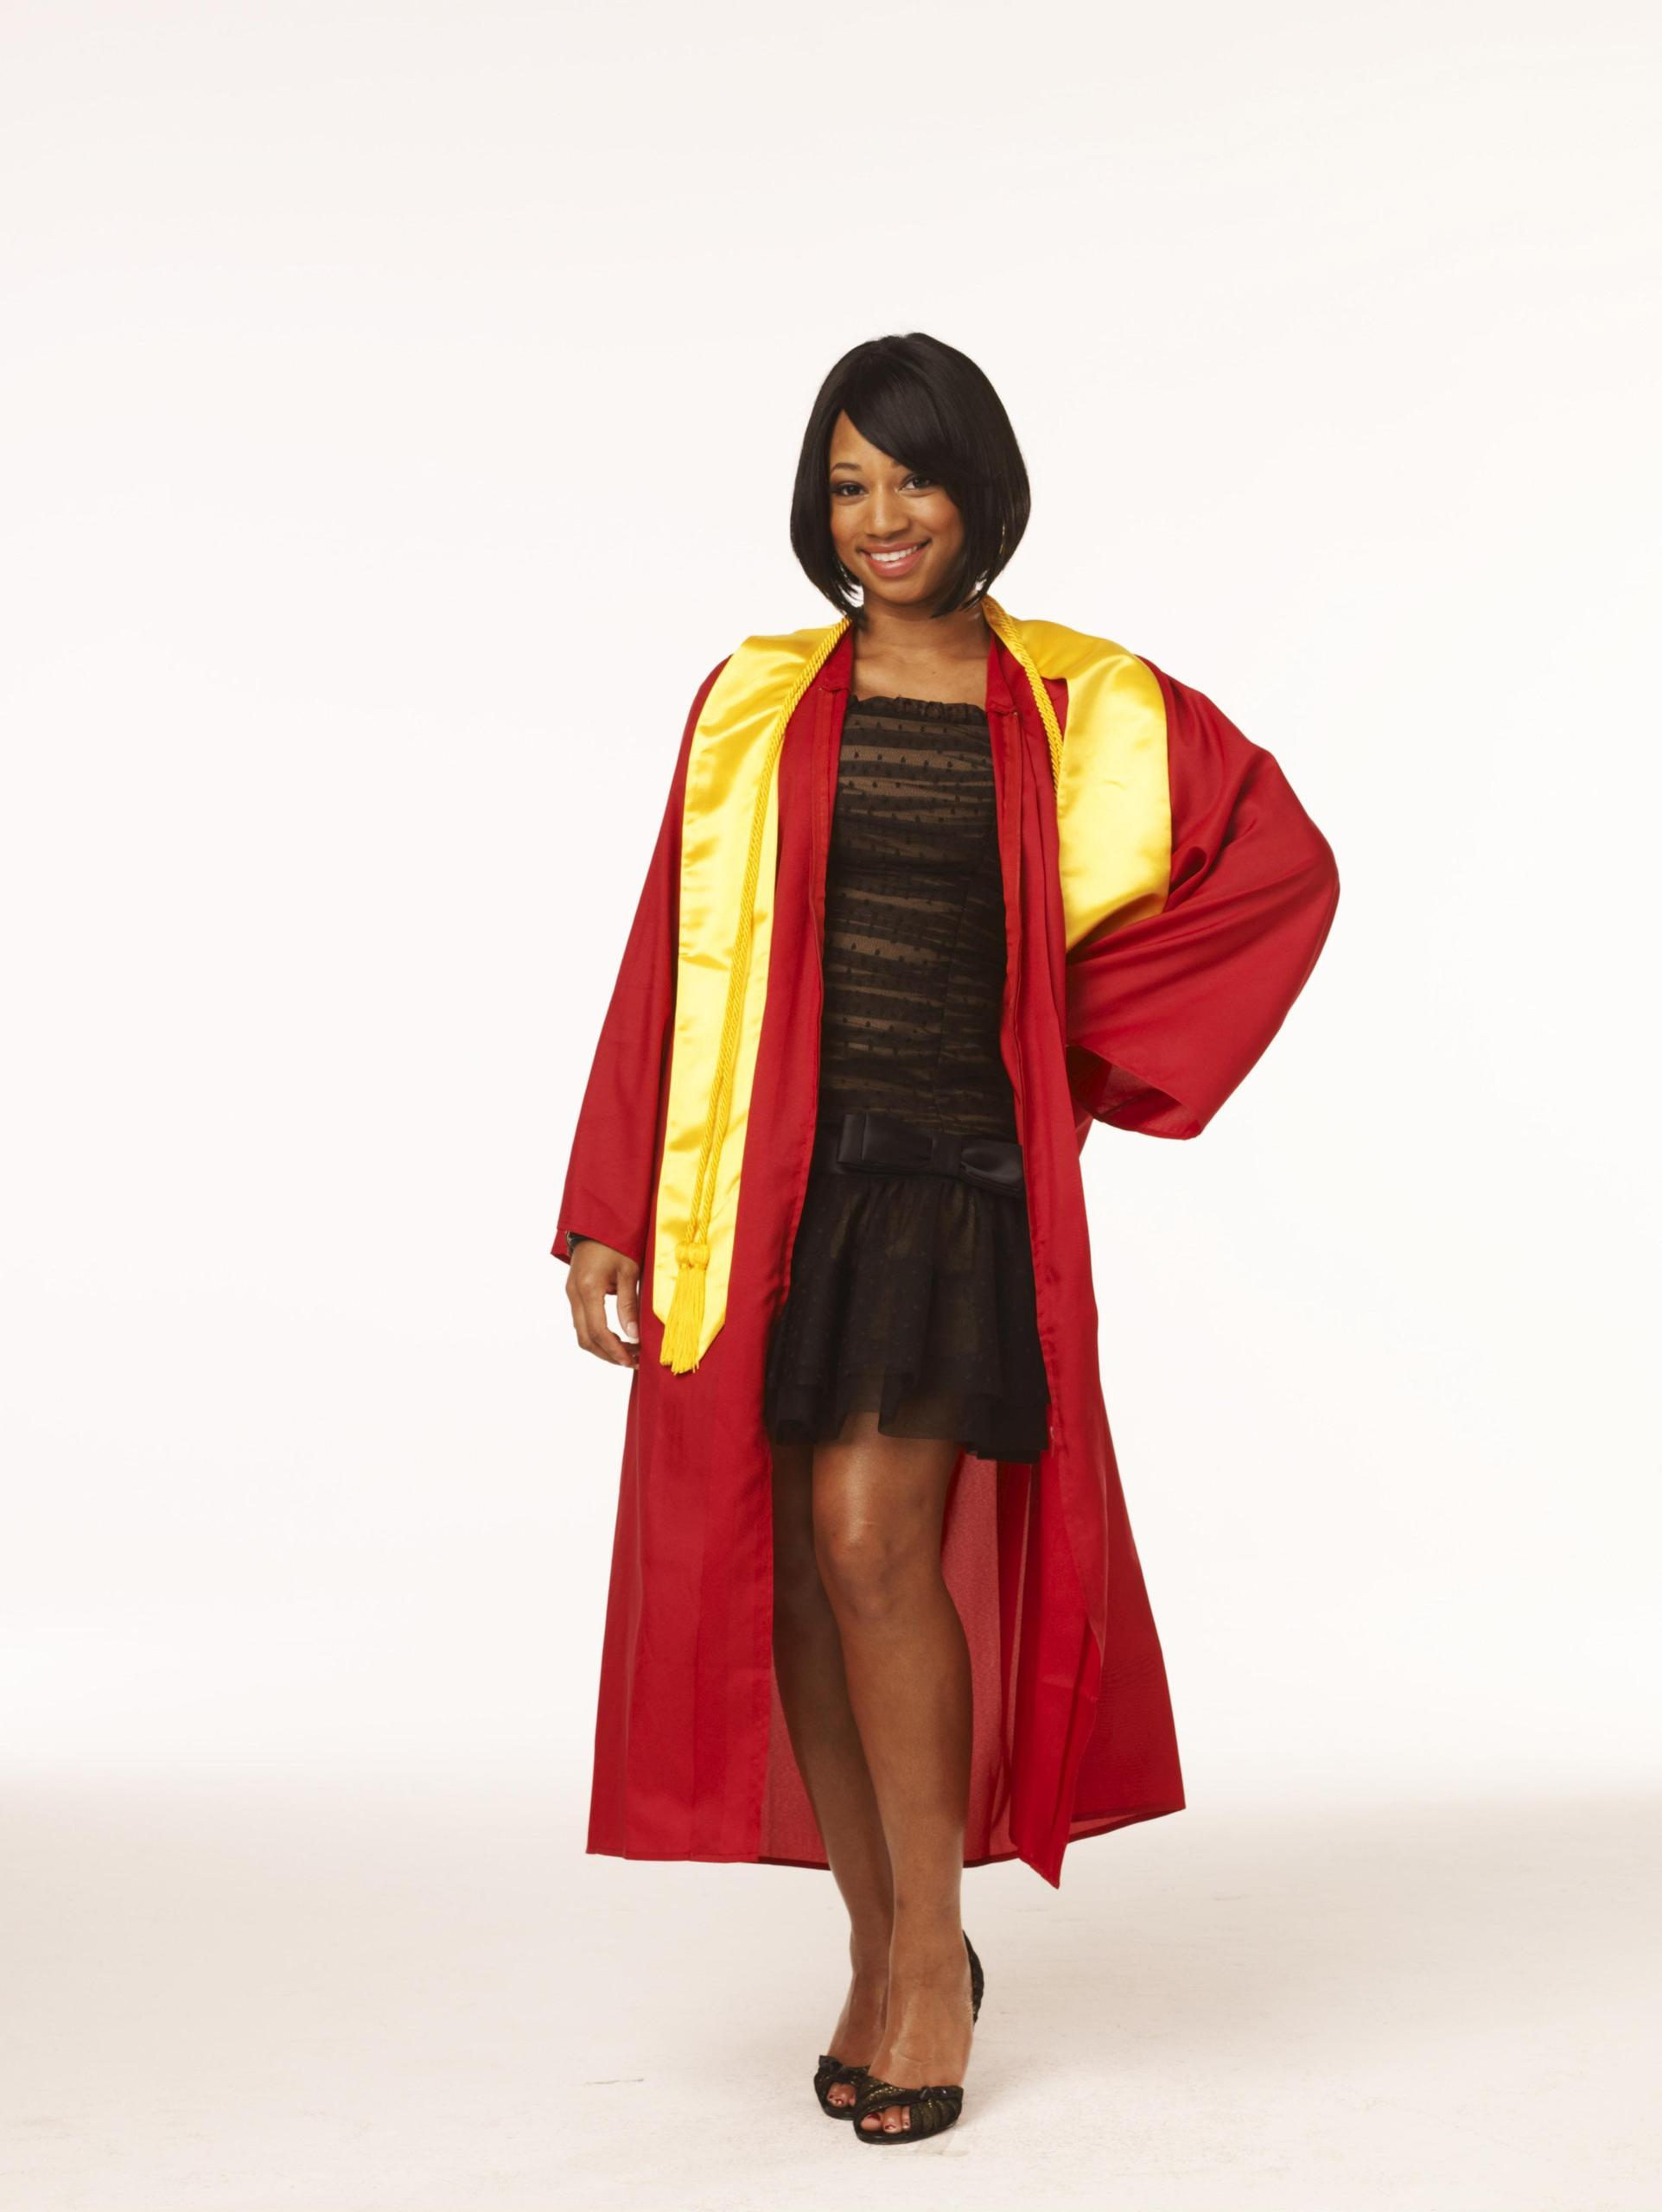 High School Musical 3 - Monique Coleman  - high-school-musical photo